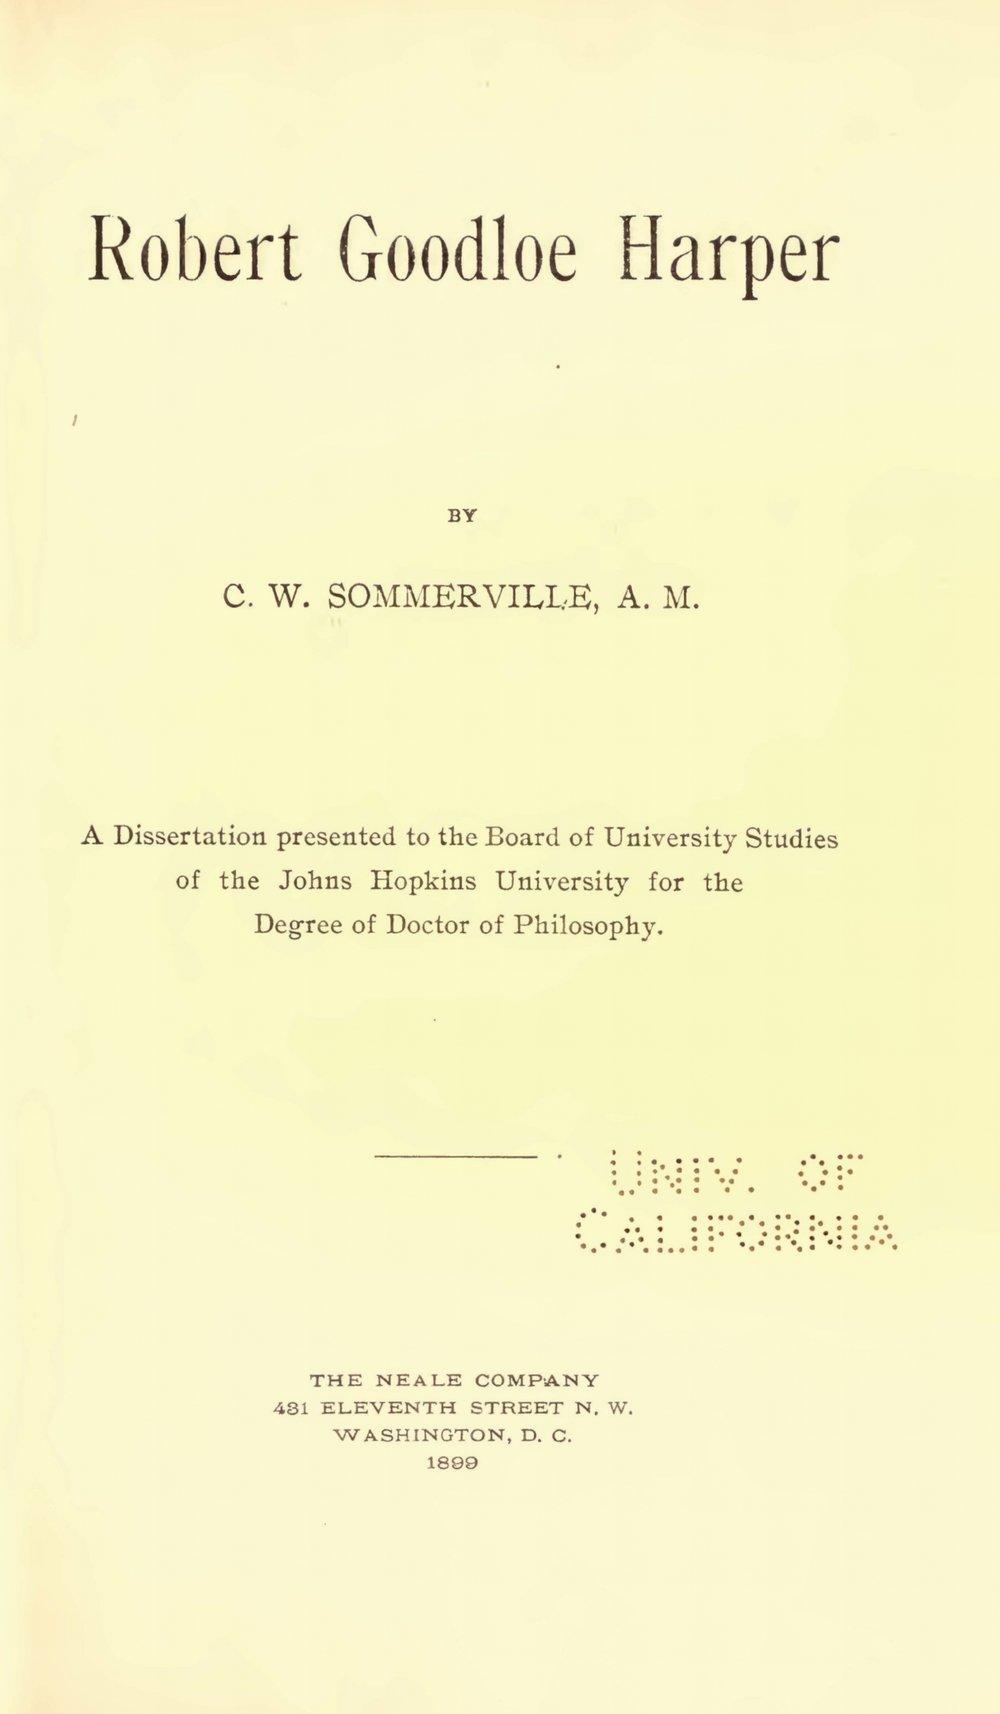 Sommerville, Charles William, Robert Goodloe Harper Title Page.jpg